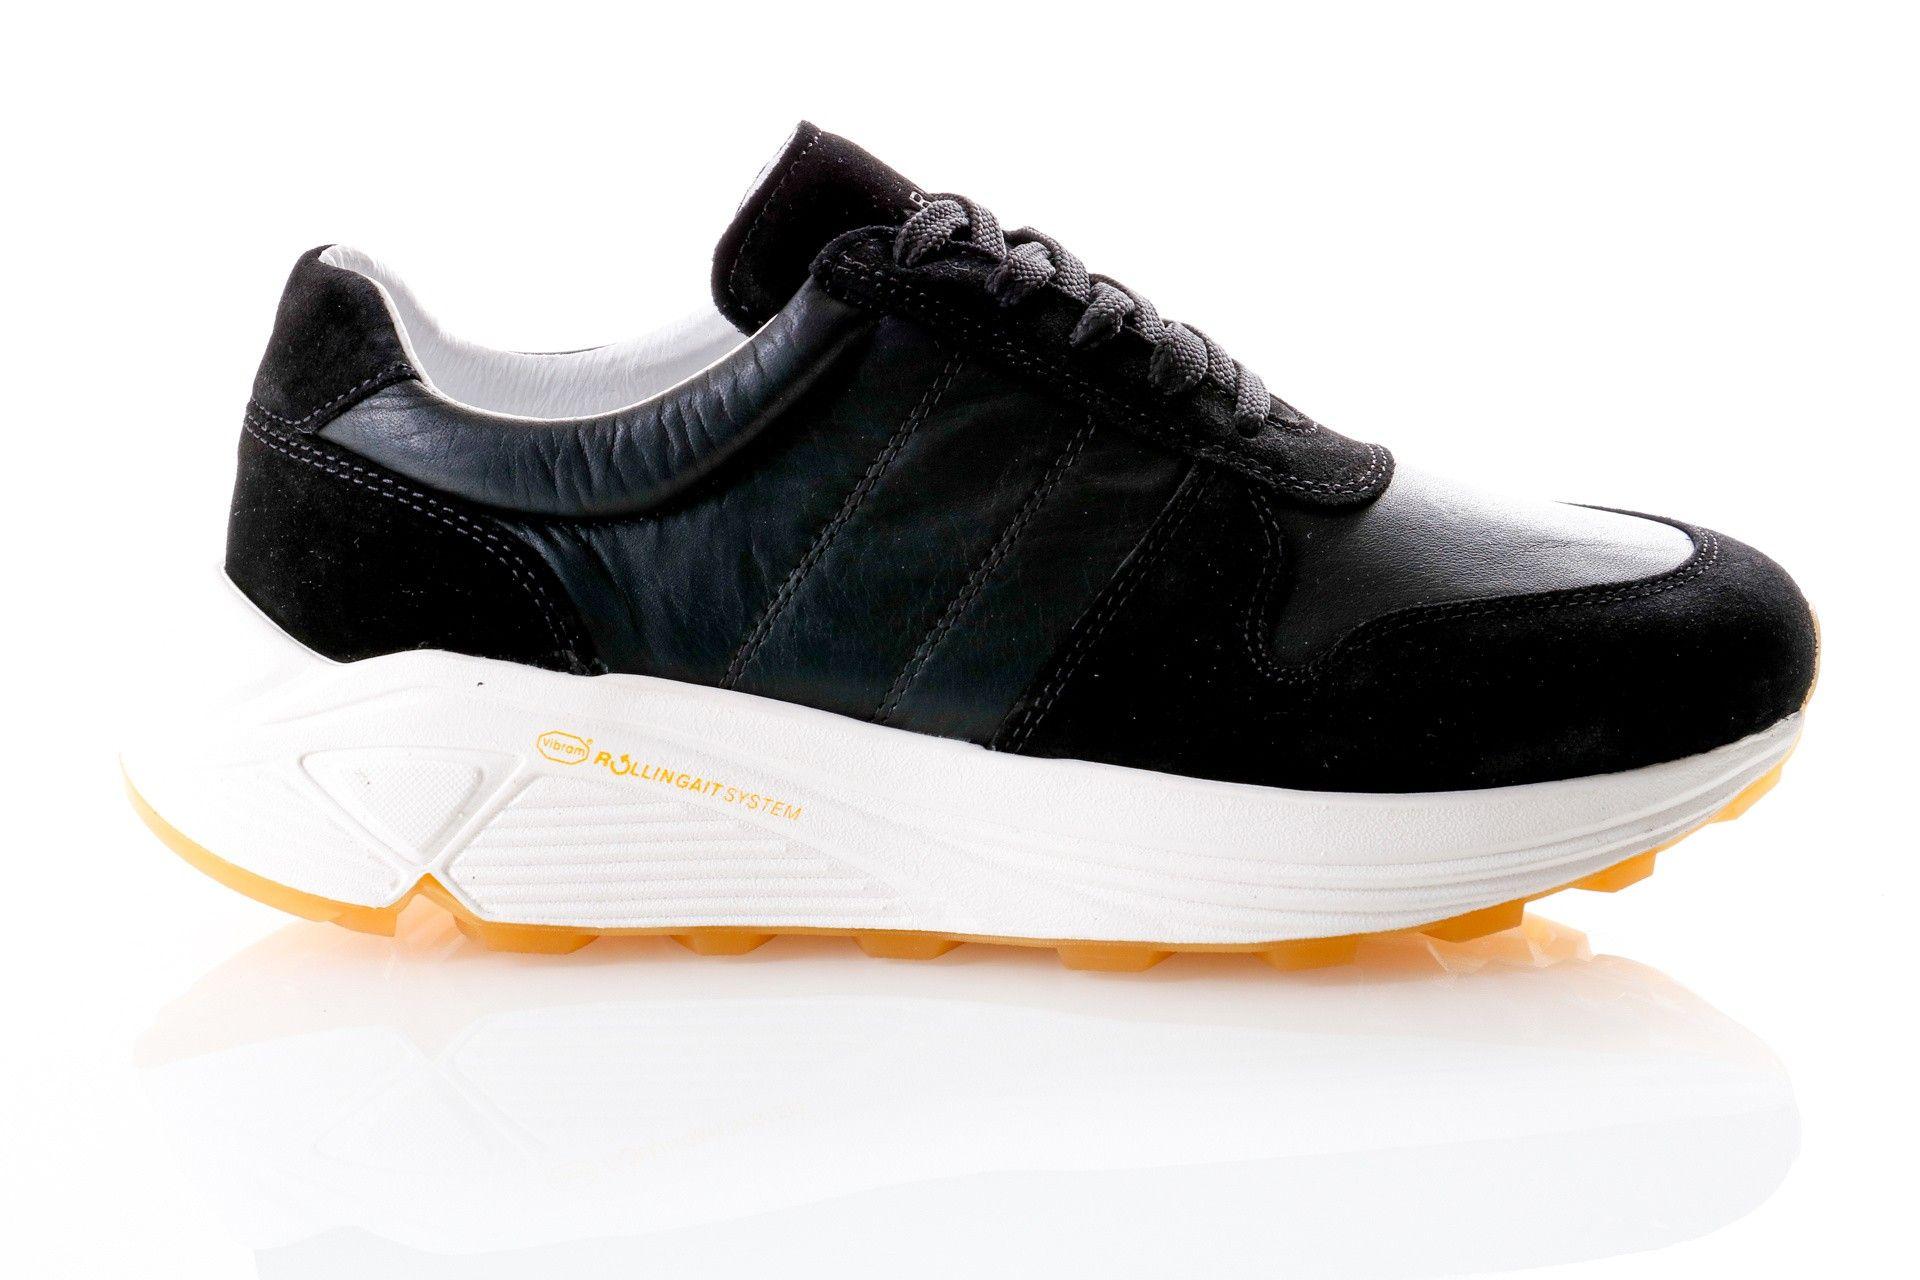 Afbeelding van Garment Project Runner Gp1763-999 Sneakers Black